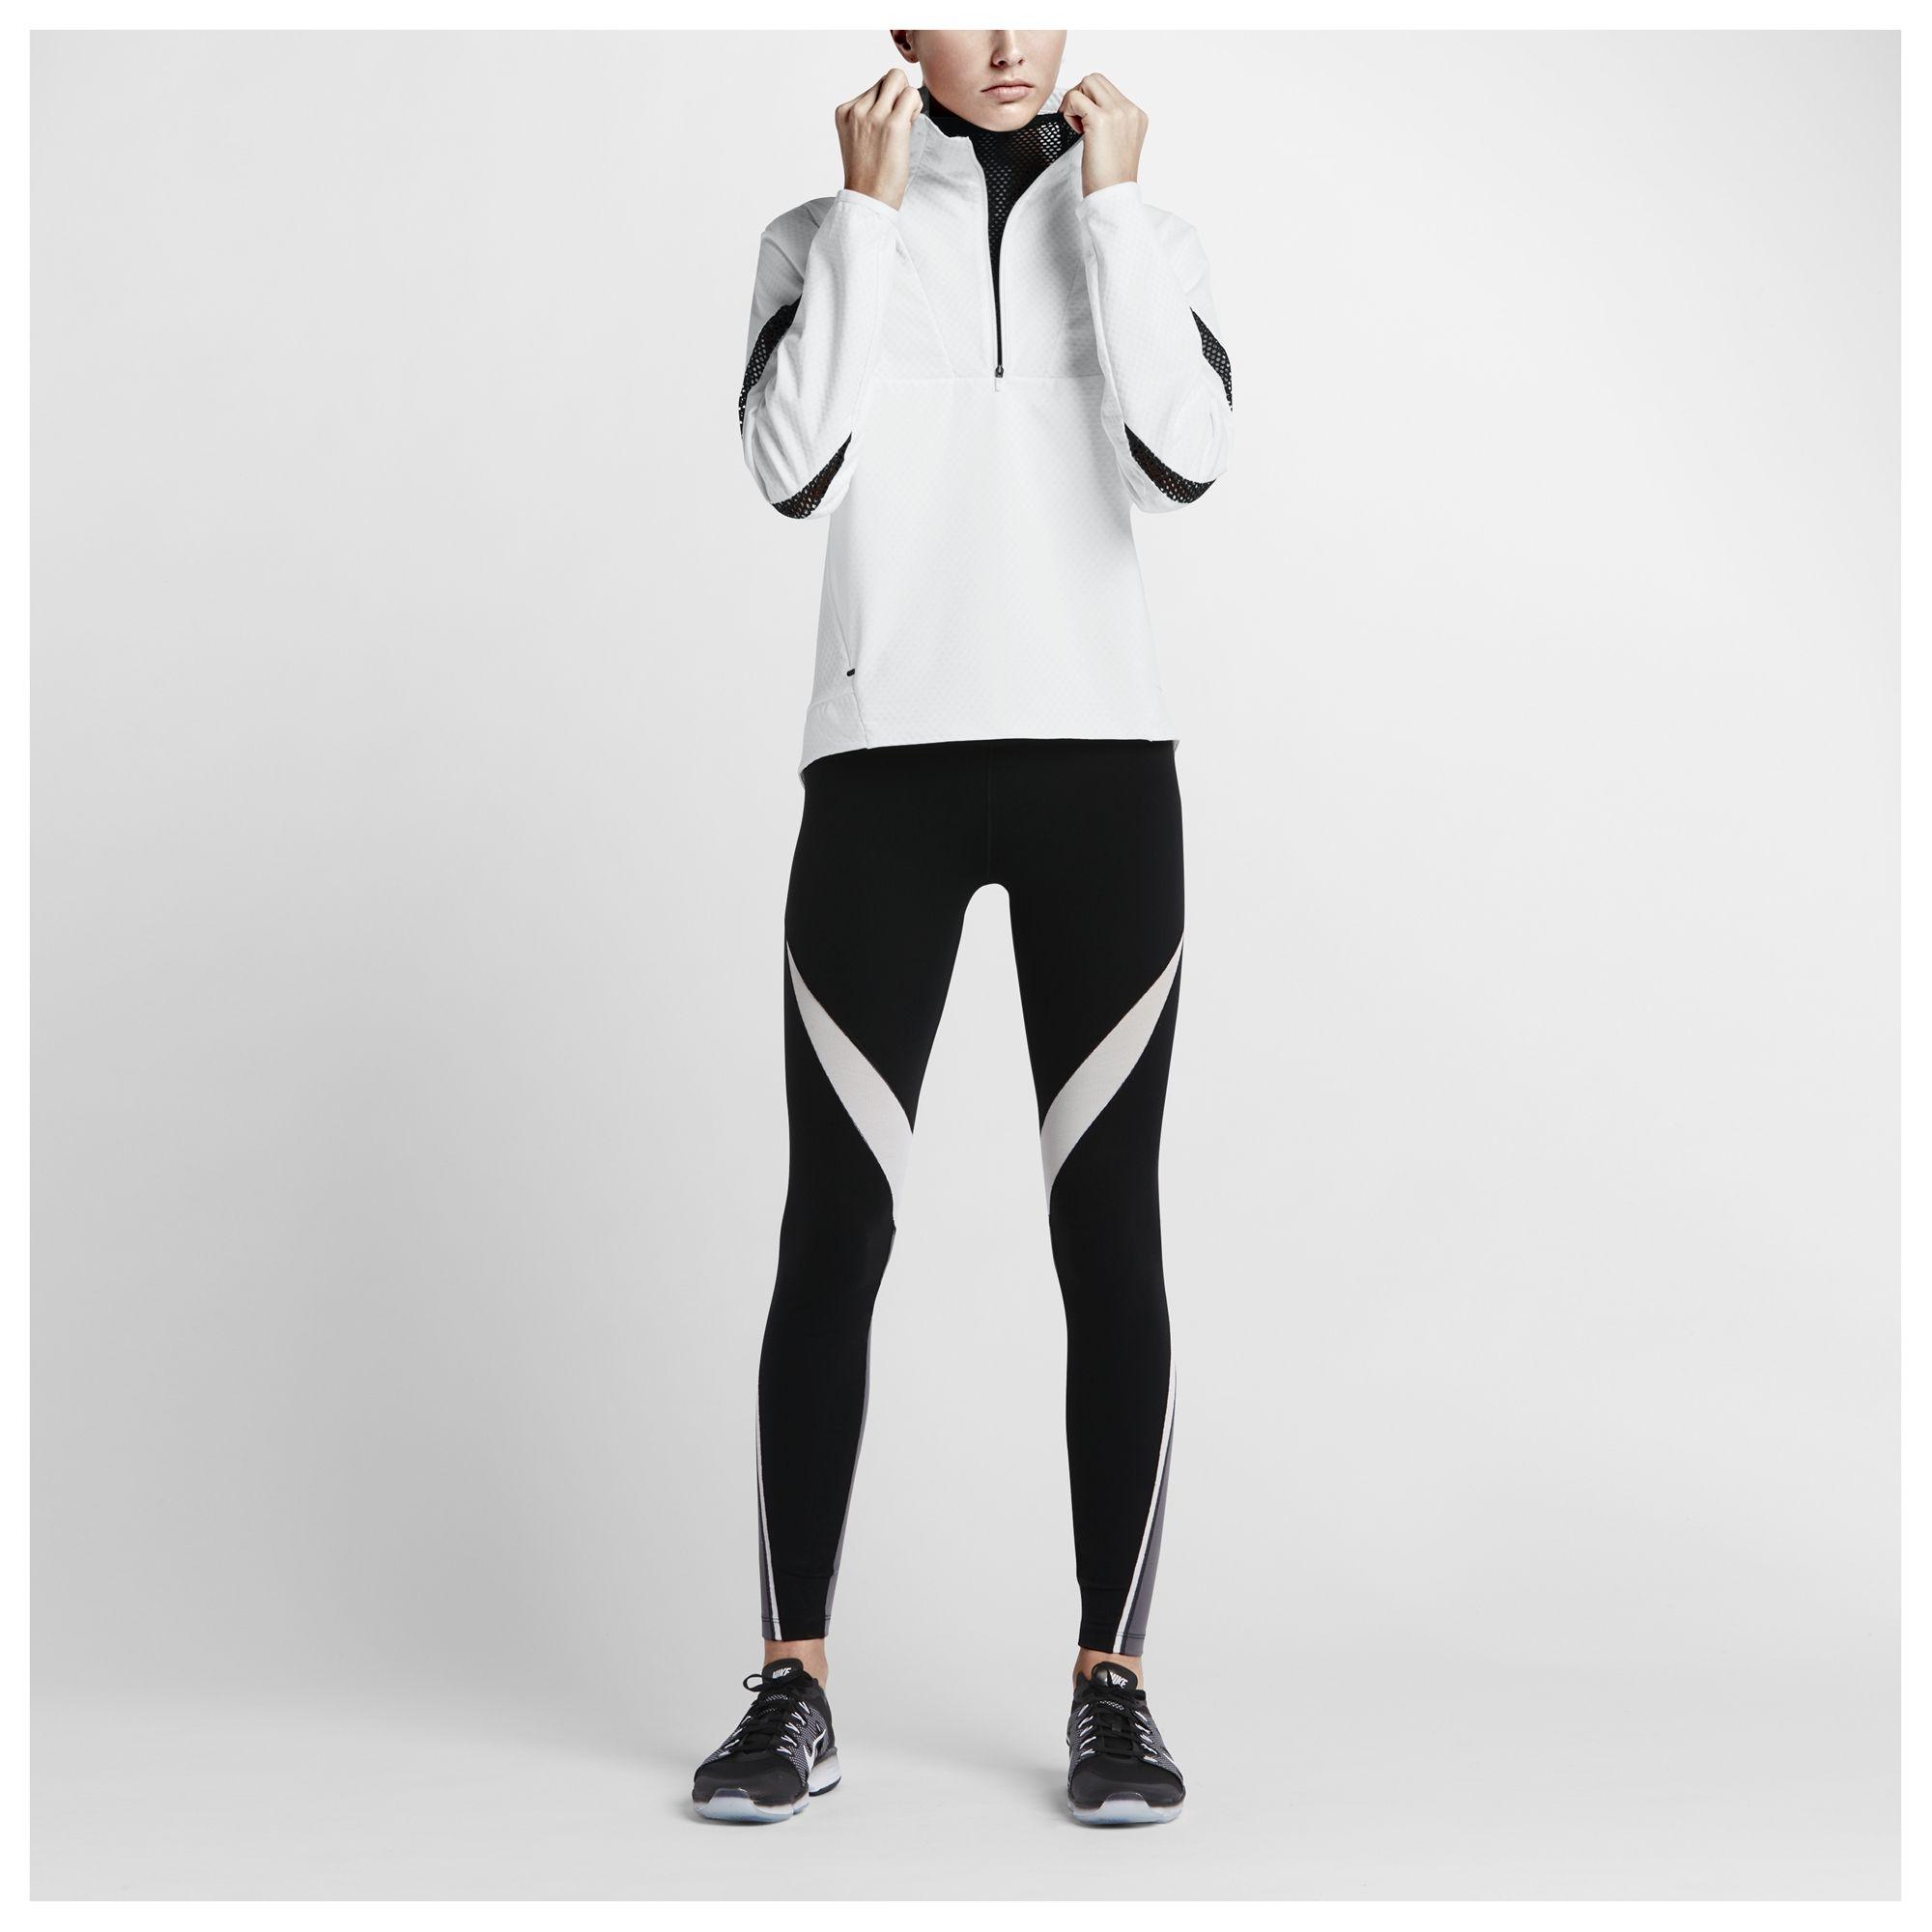 Blusão Nike Motion Coverup Feminino   Nike